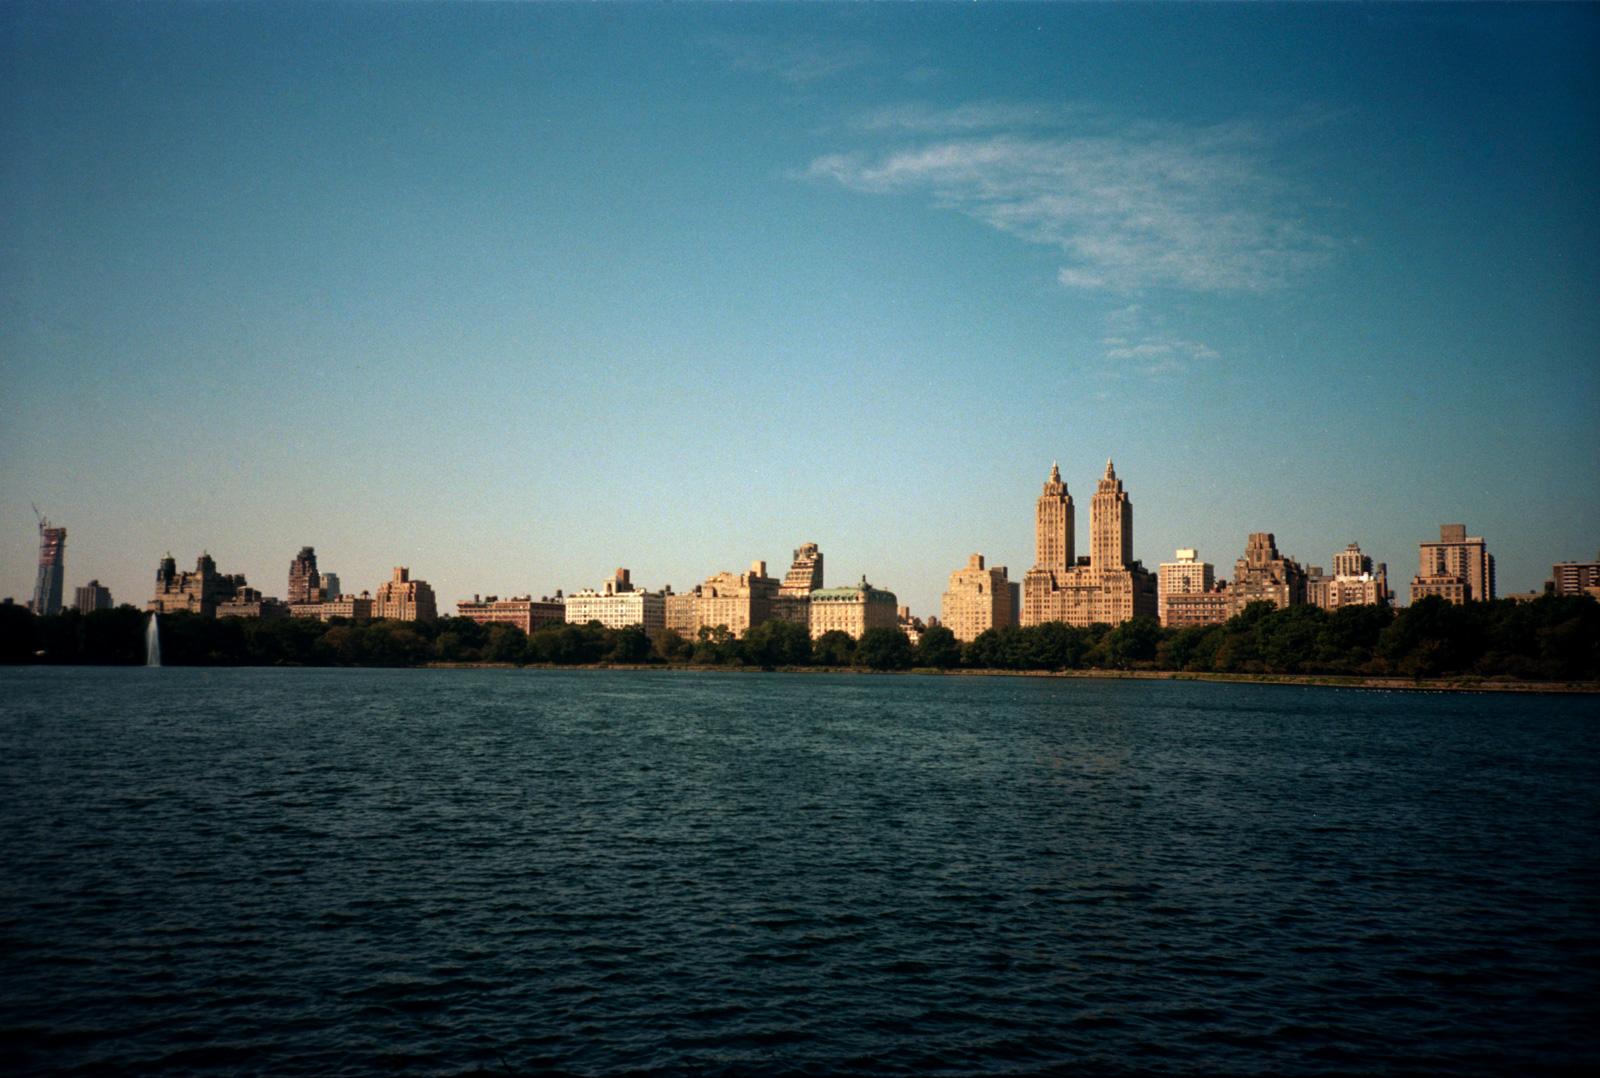 Across Jacqueline Kennedy Onassis Reservoir. Lonely New York Series By Ioannis Koussertari.